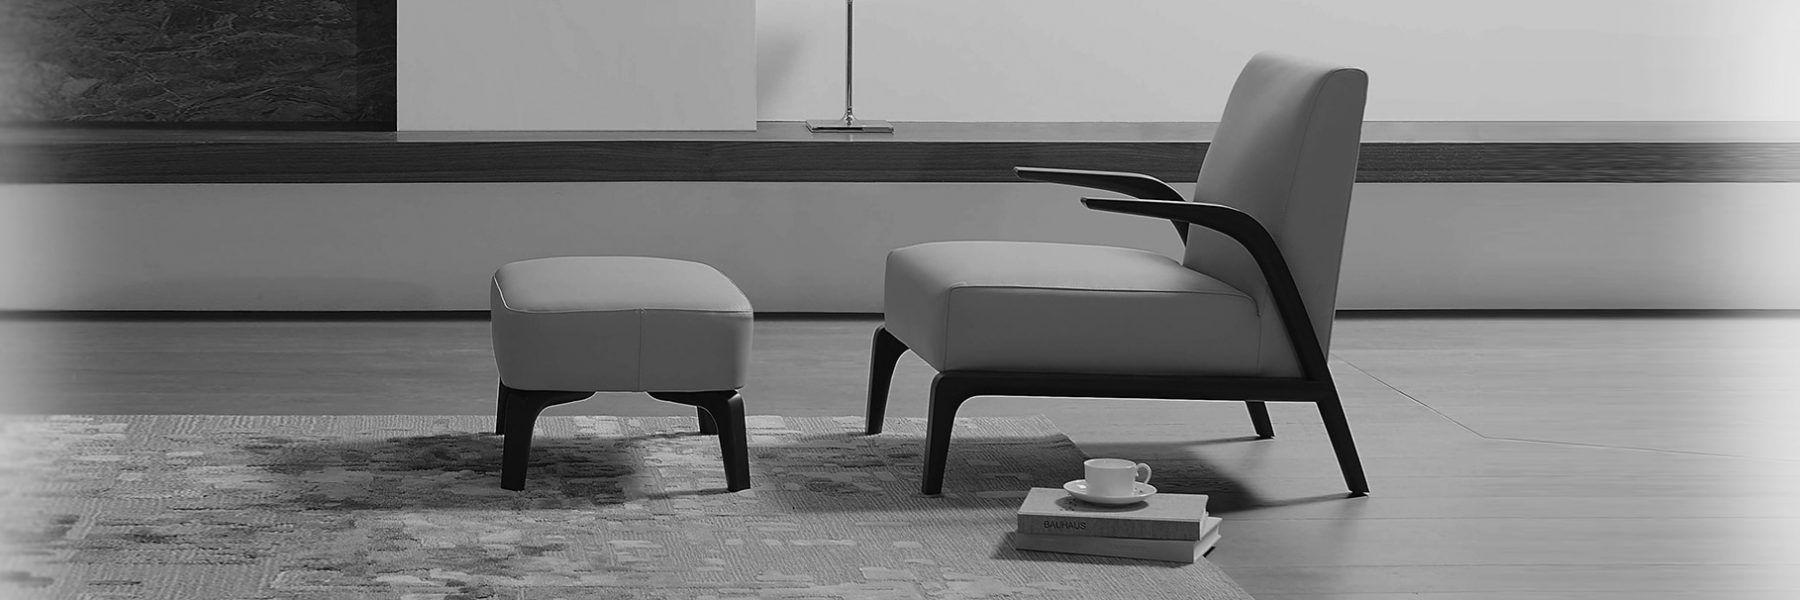 RM Living Cincinnati Contemporary Interior Design Modern Furniture By Camerich